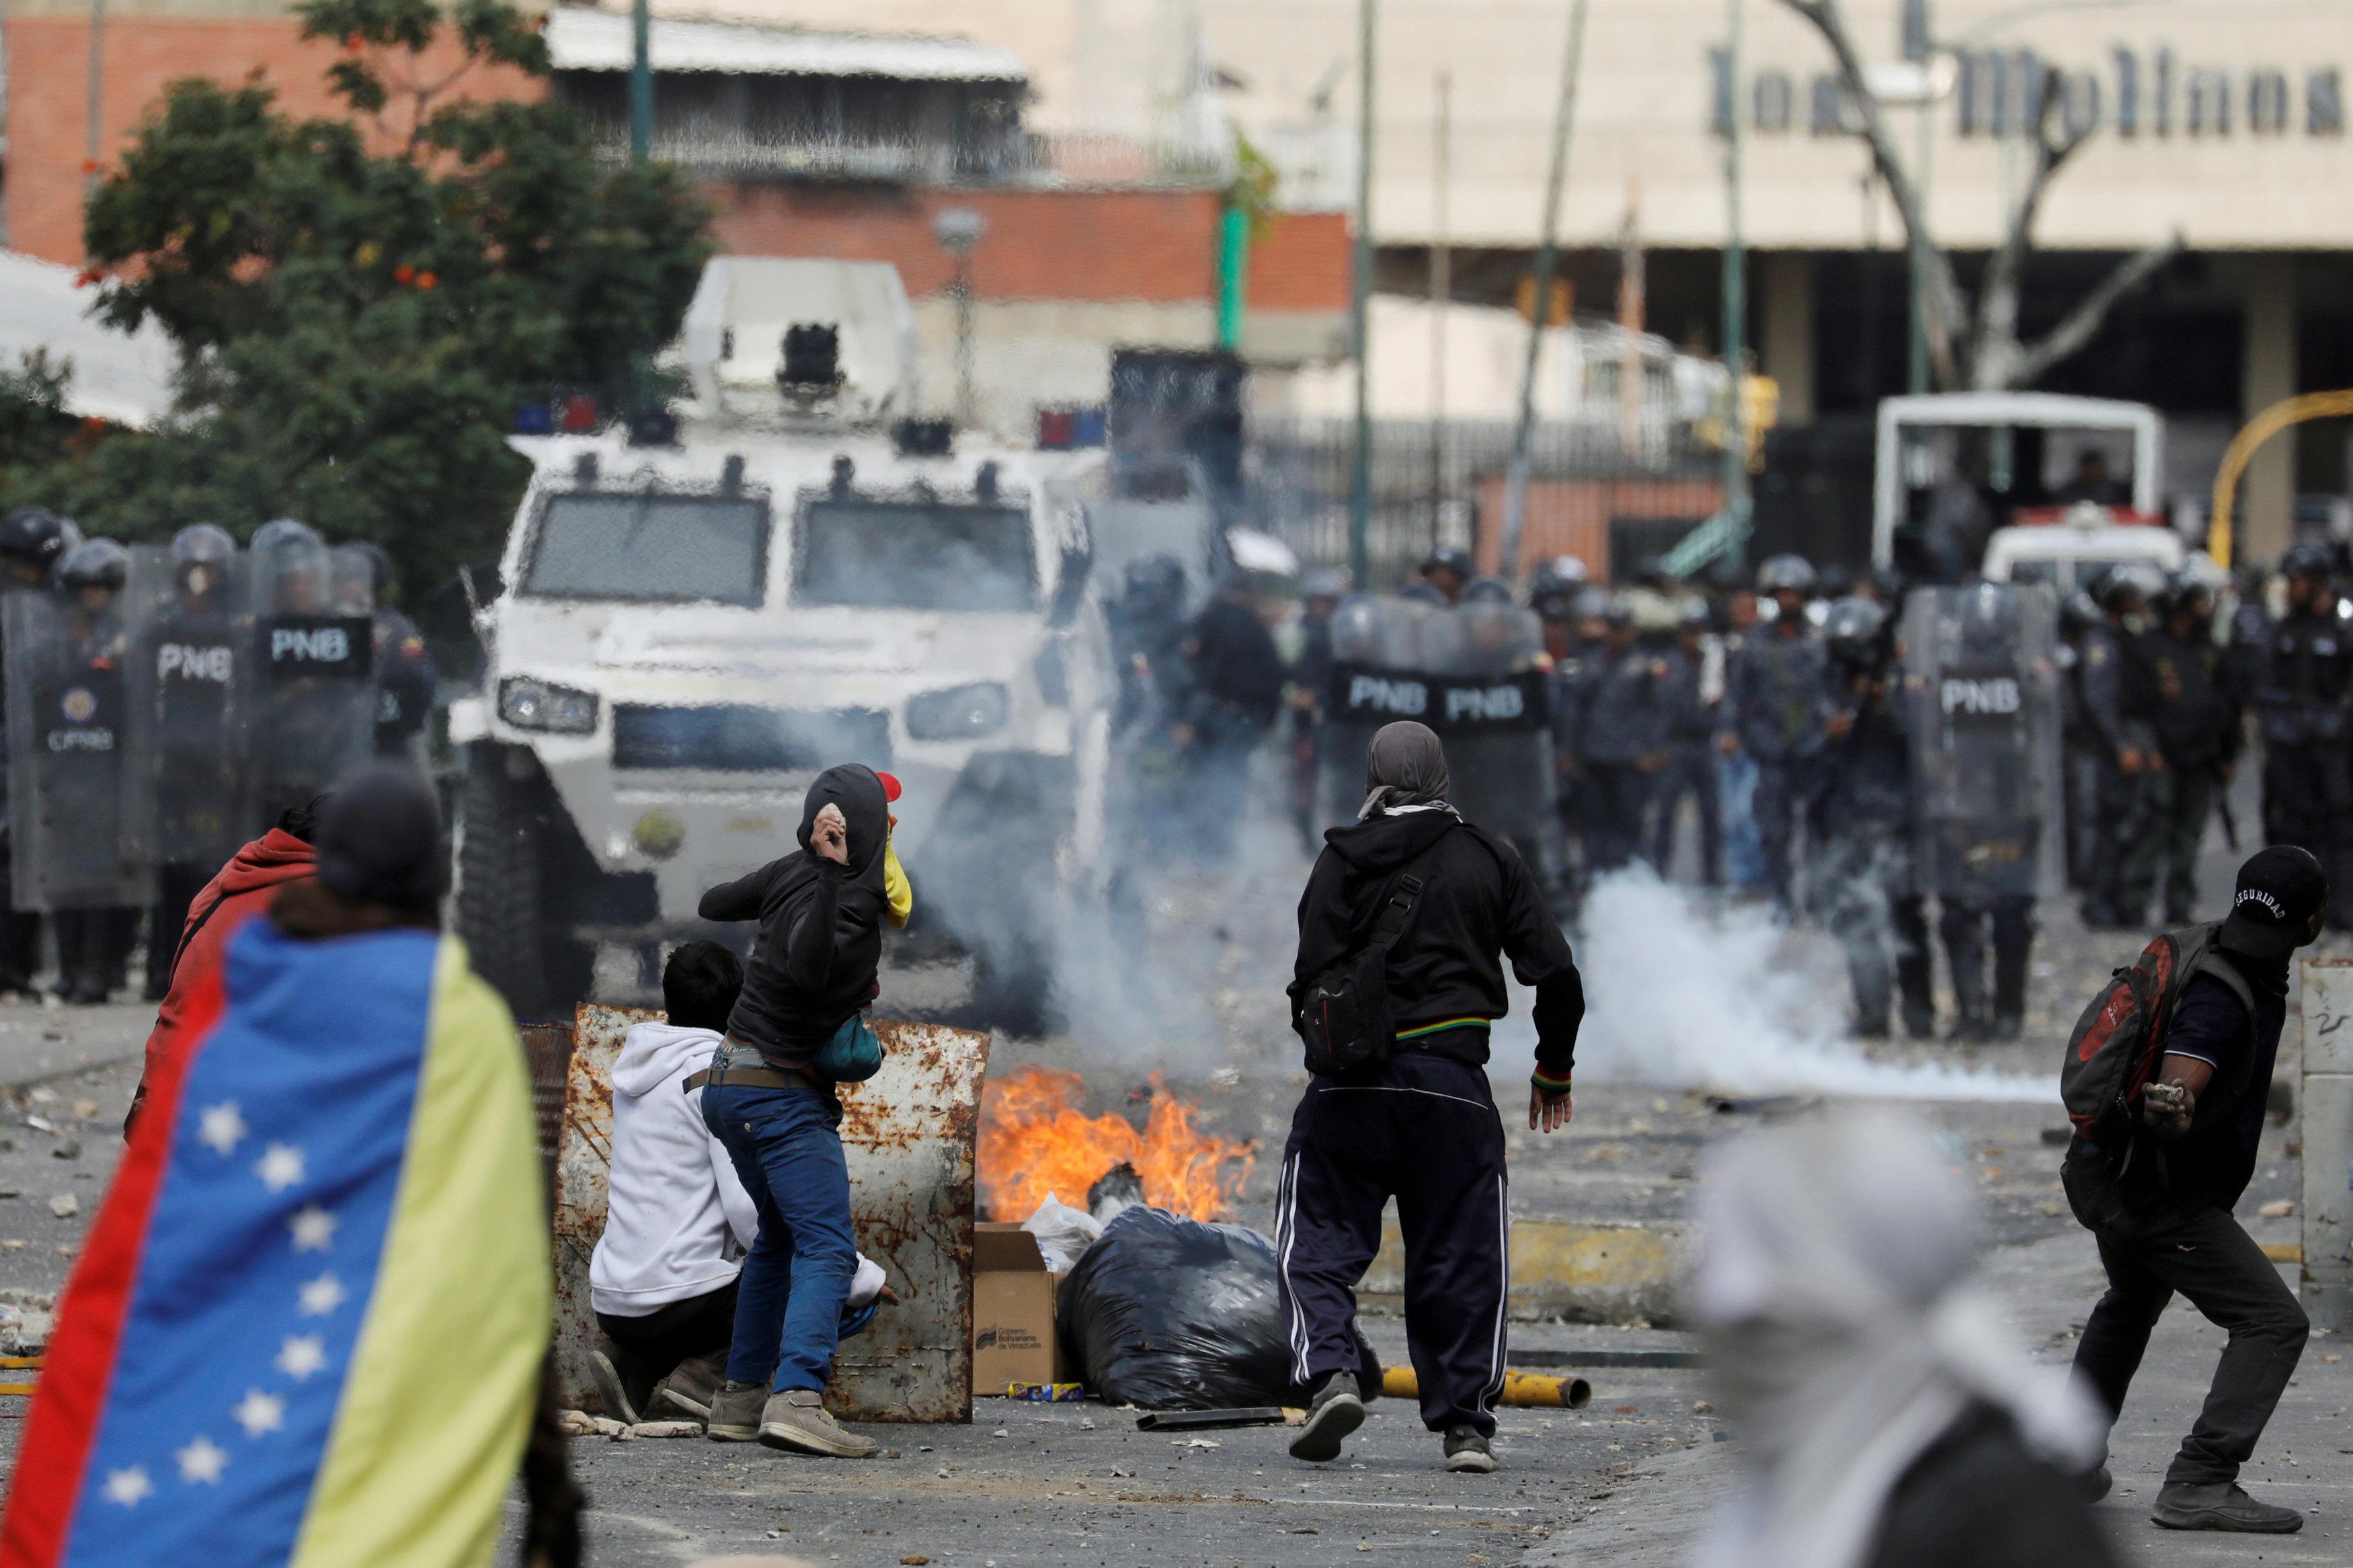 2019-01-24T234157Z_1246635247_RC1BC8519150_RTRMADP_3_VENEZUELA-POLITICS-PROTESTERS